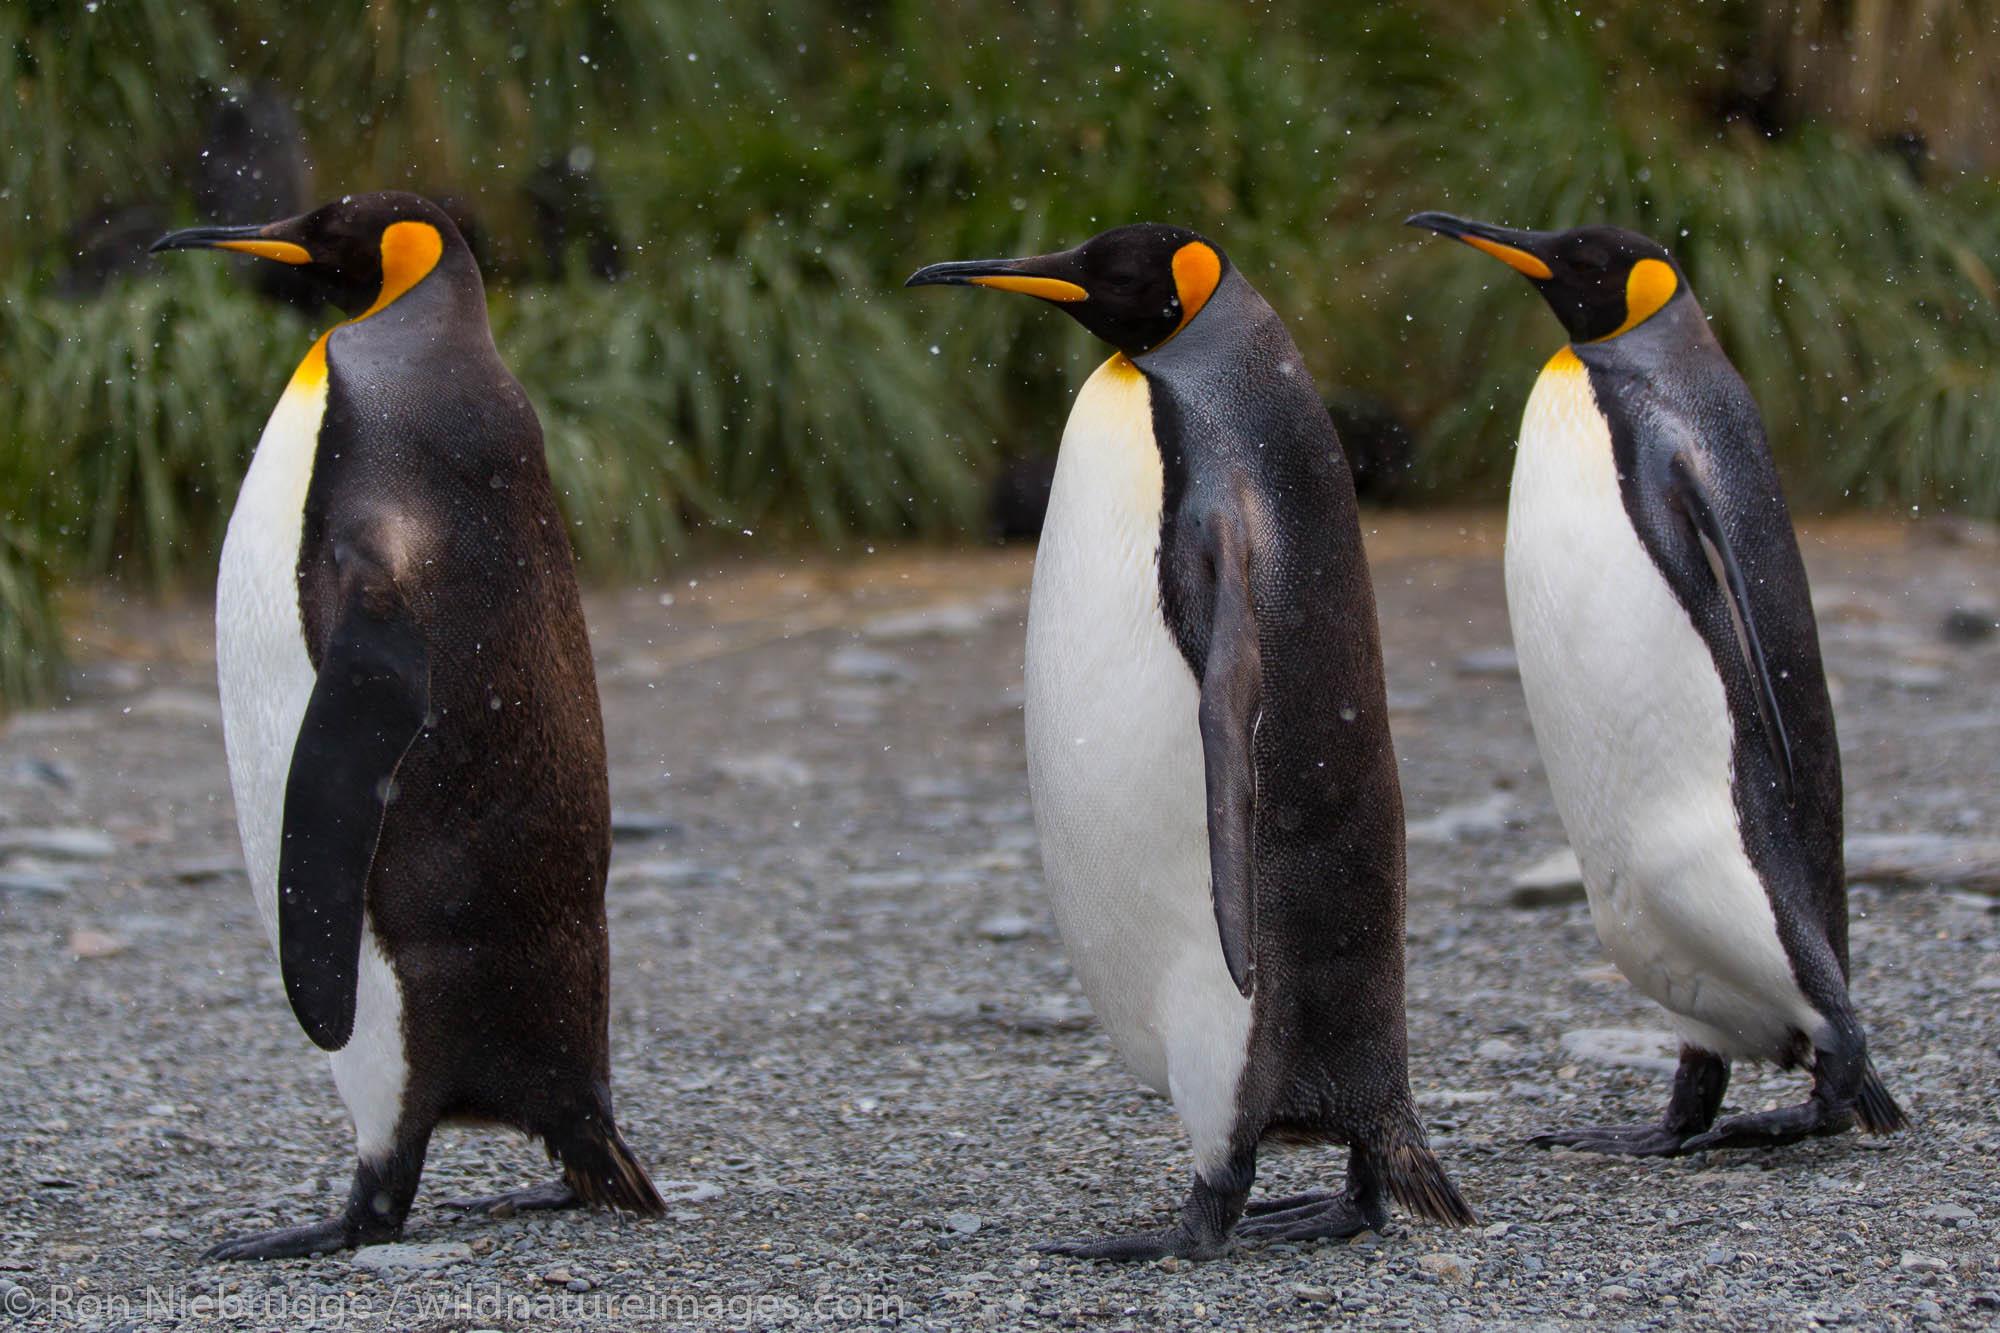 Fortuna Bay, South Georgia, Antarctica.